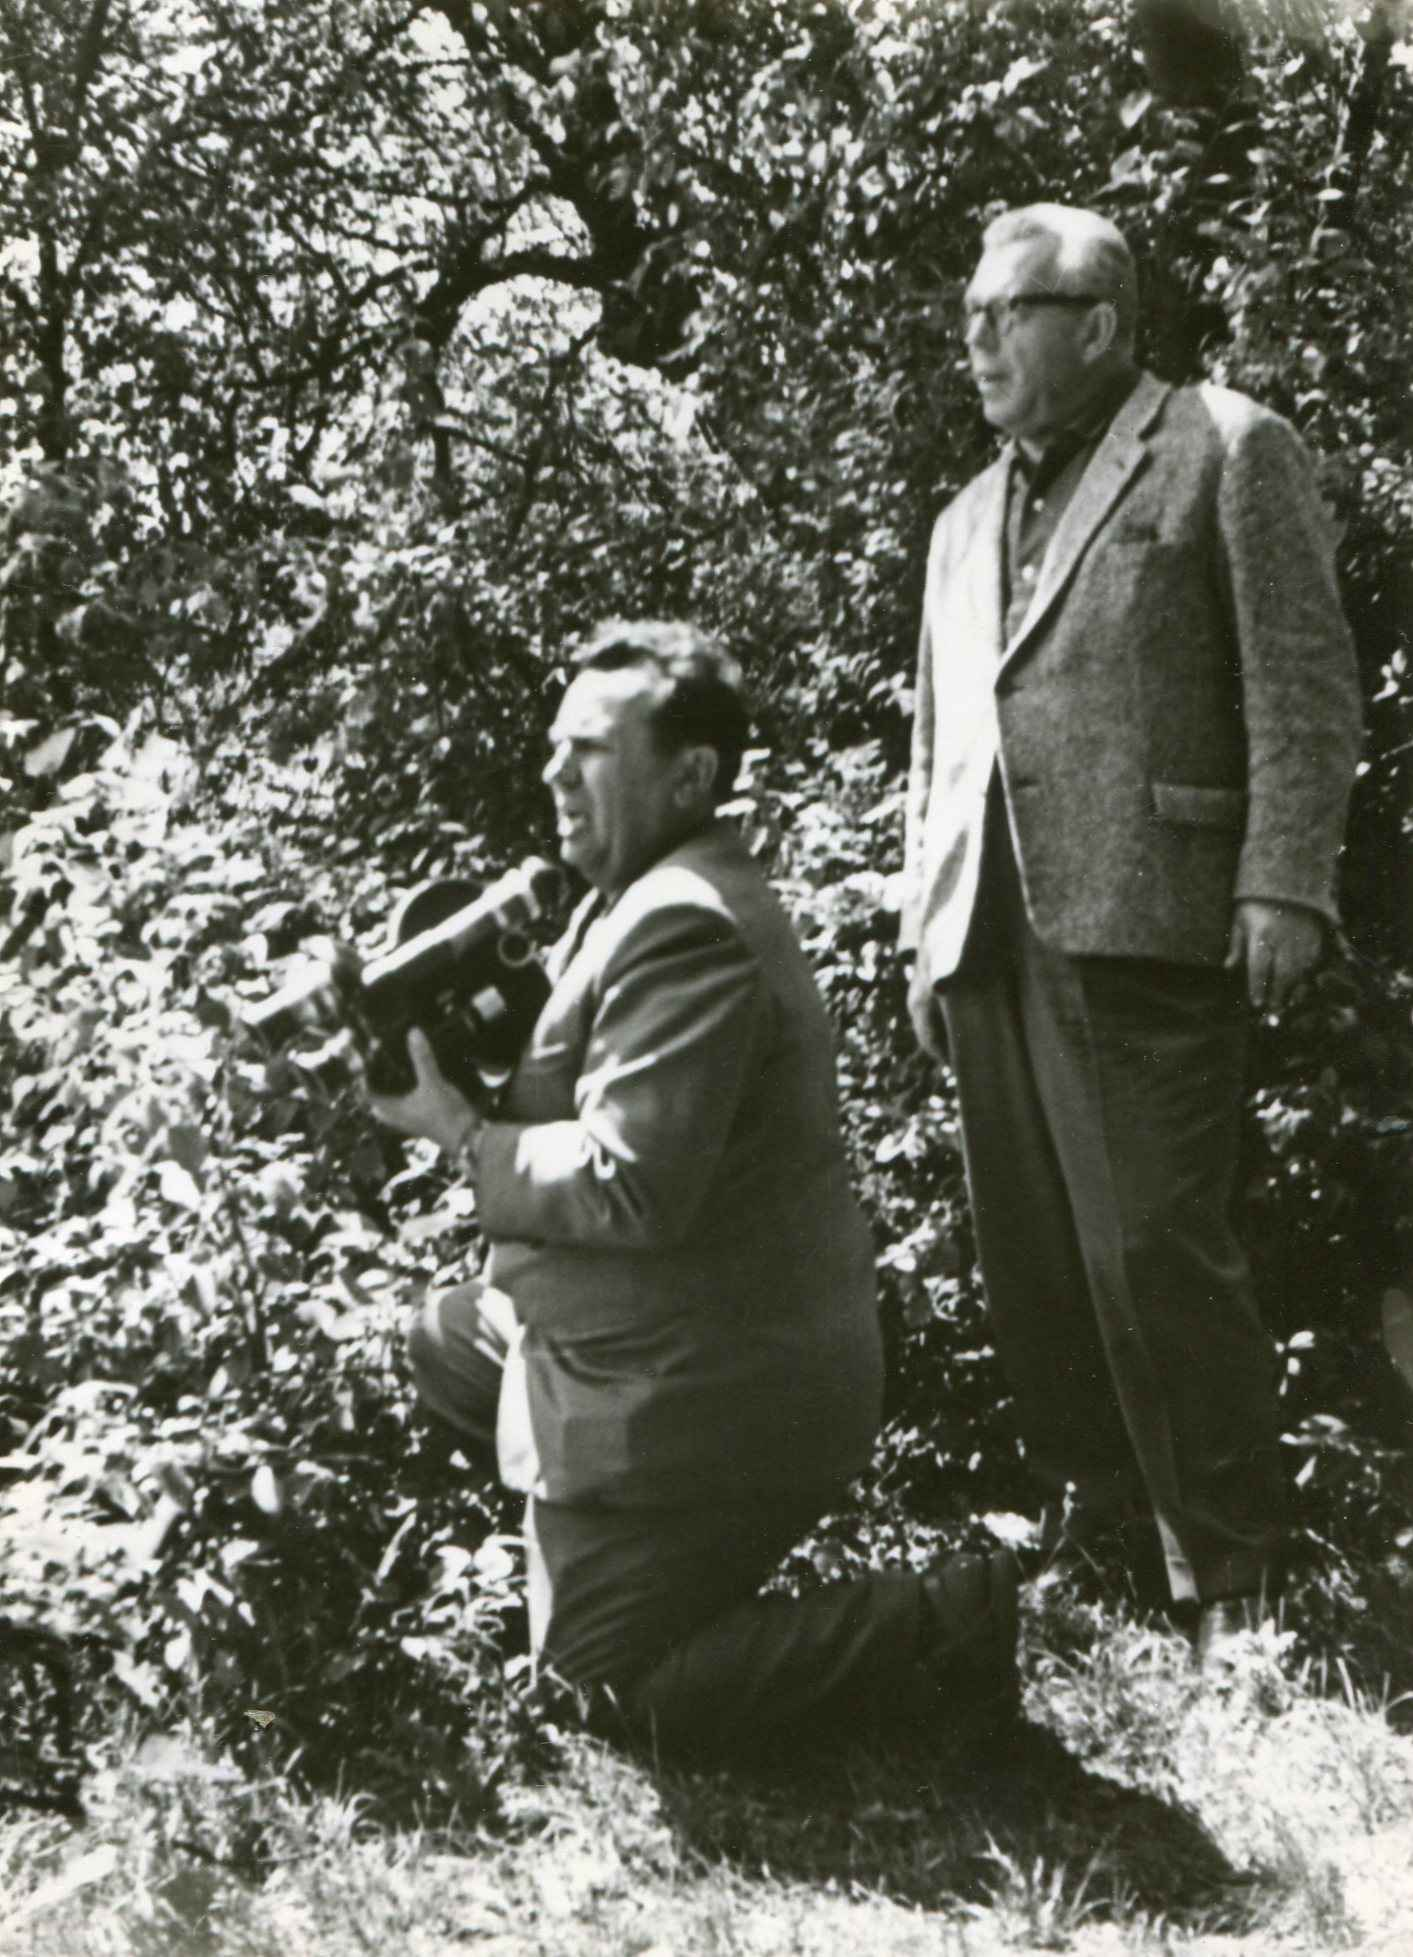 Экспонат #73. Снимает Петр Опрышко. 1967 год